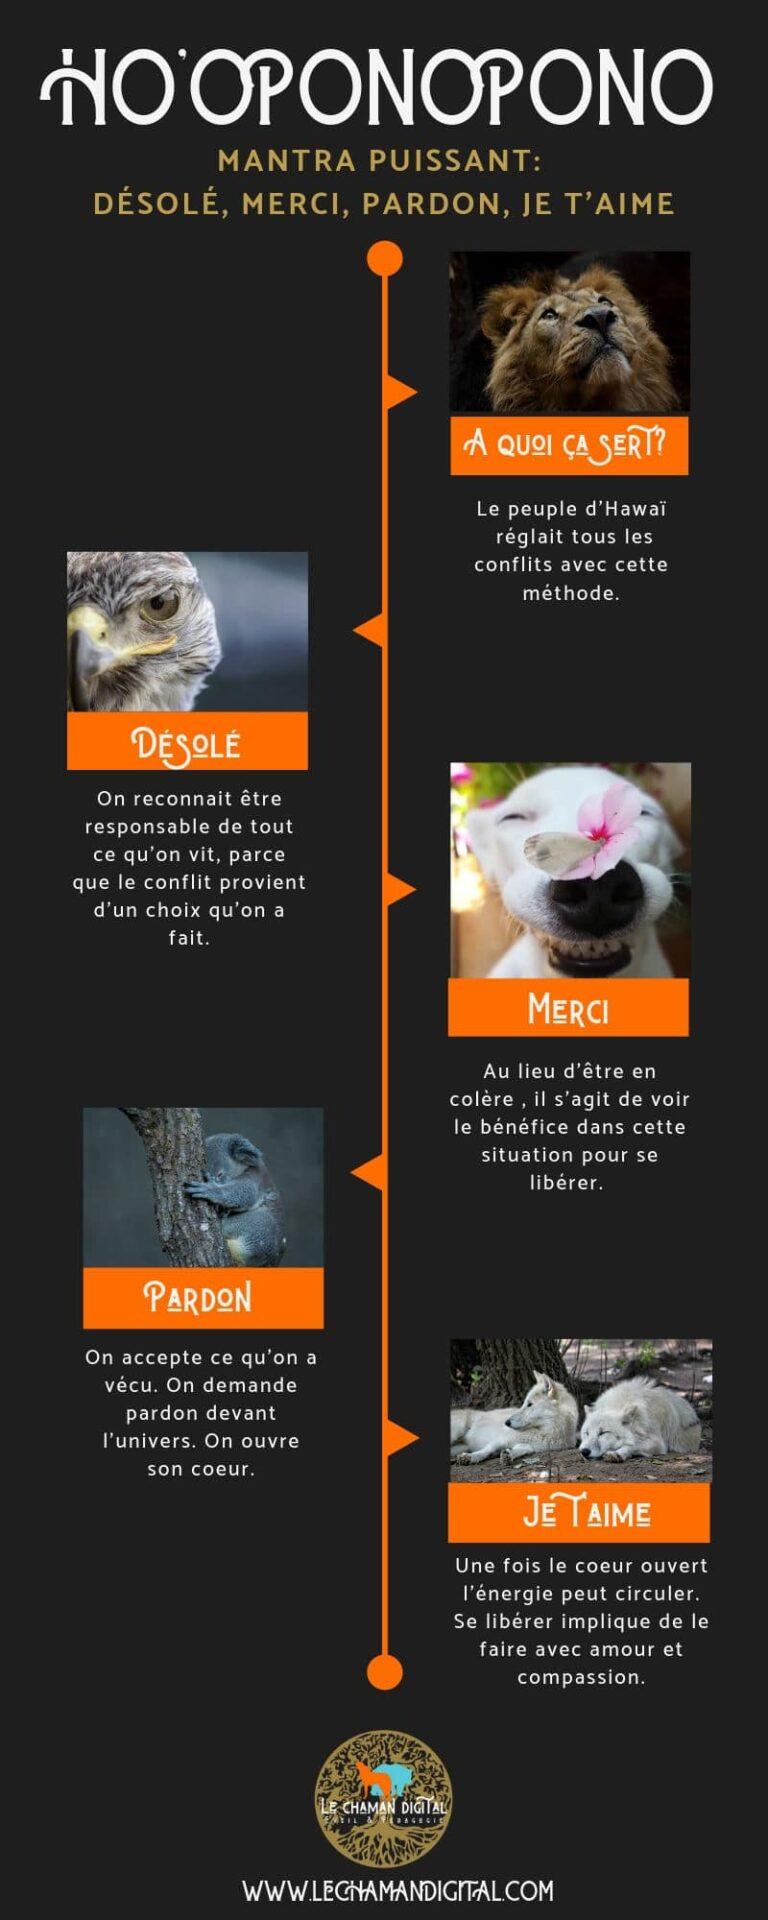 hooponopono-infographie-mantra